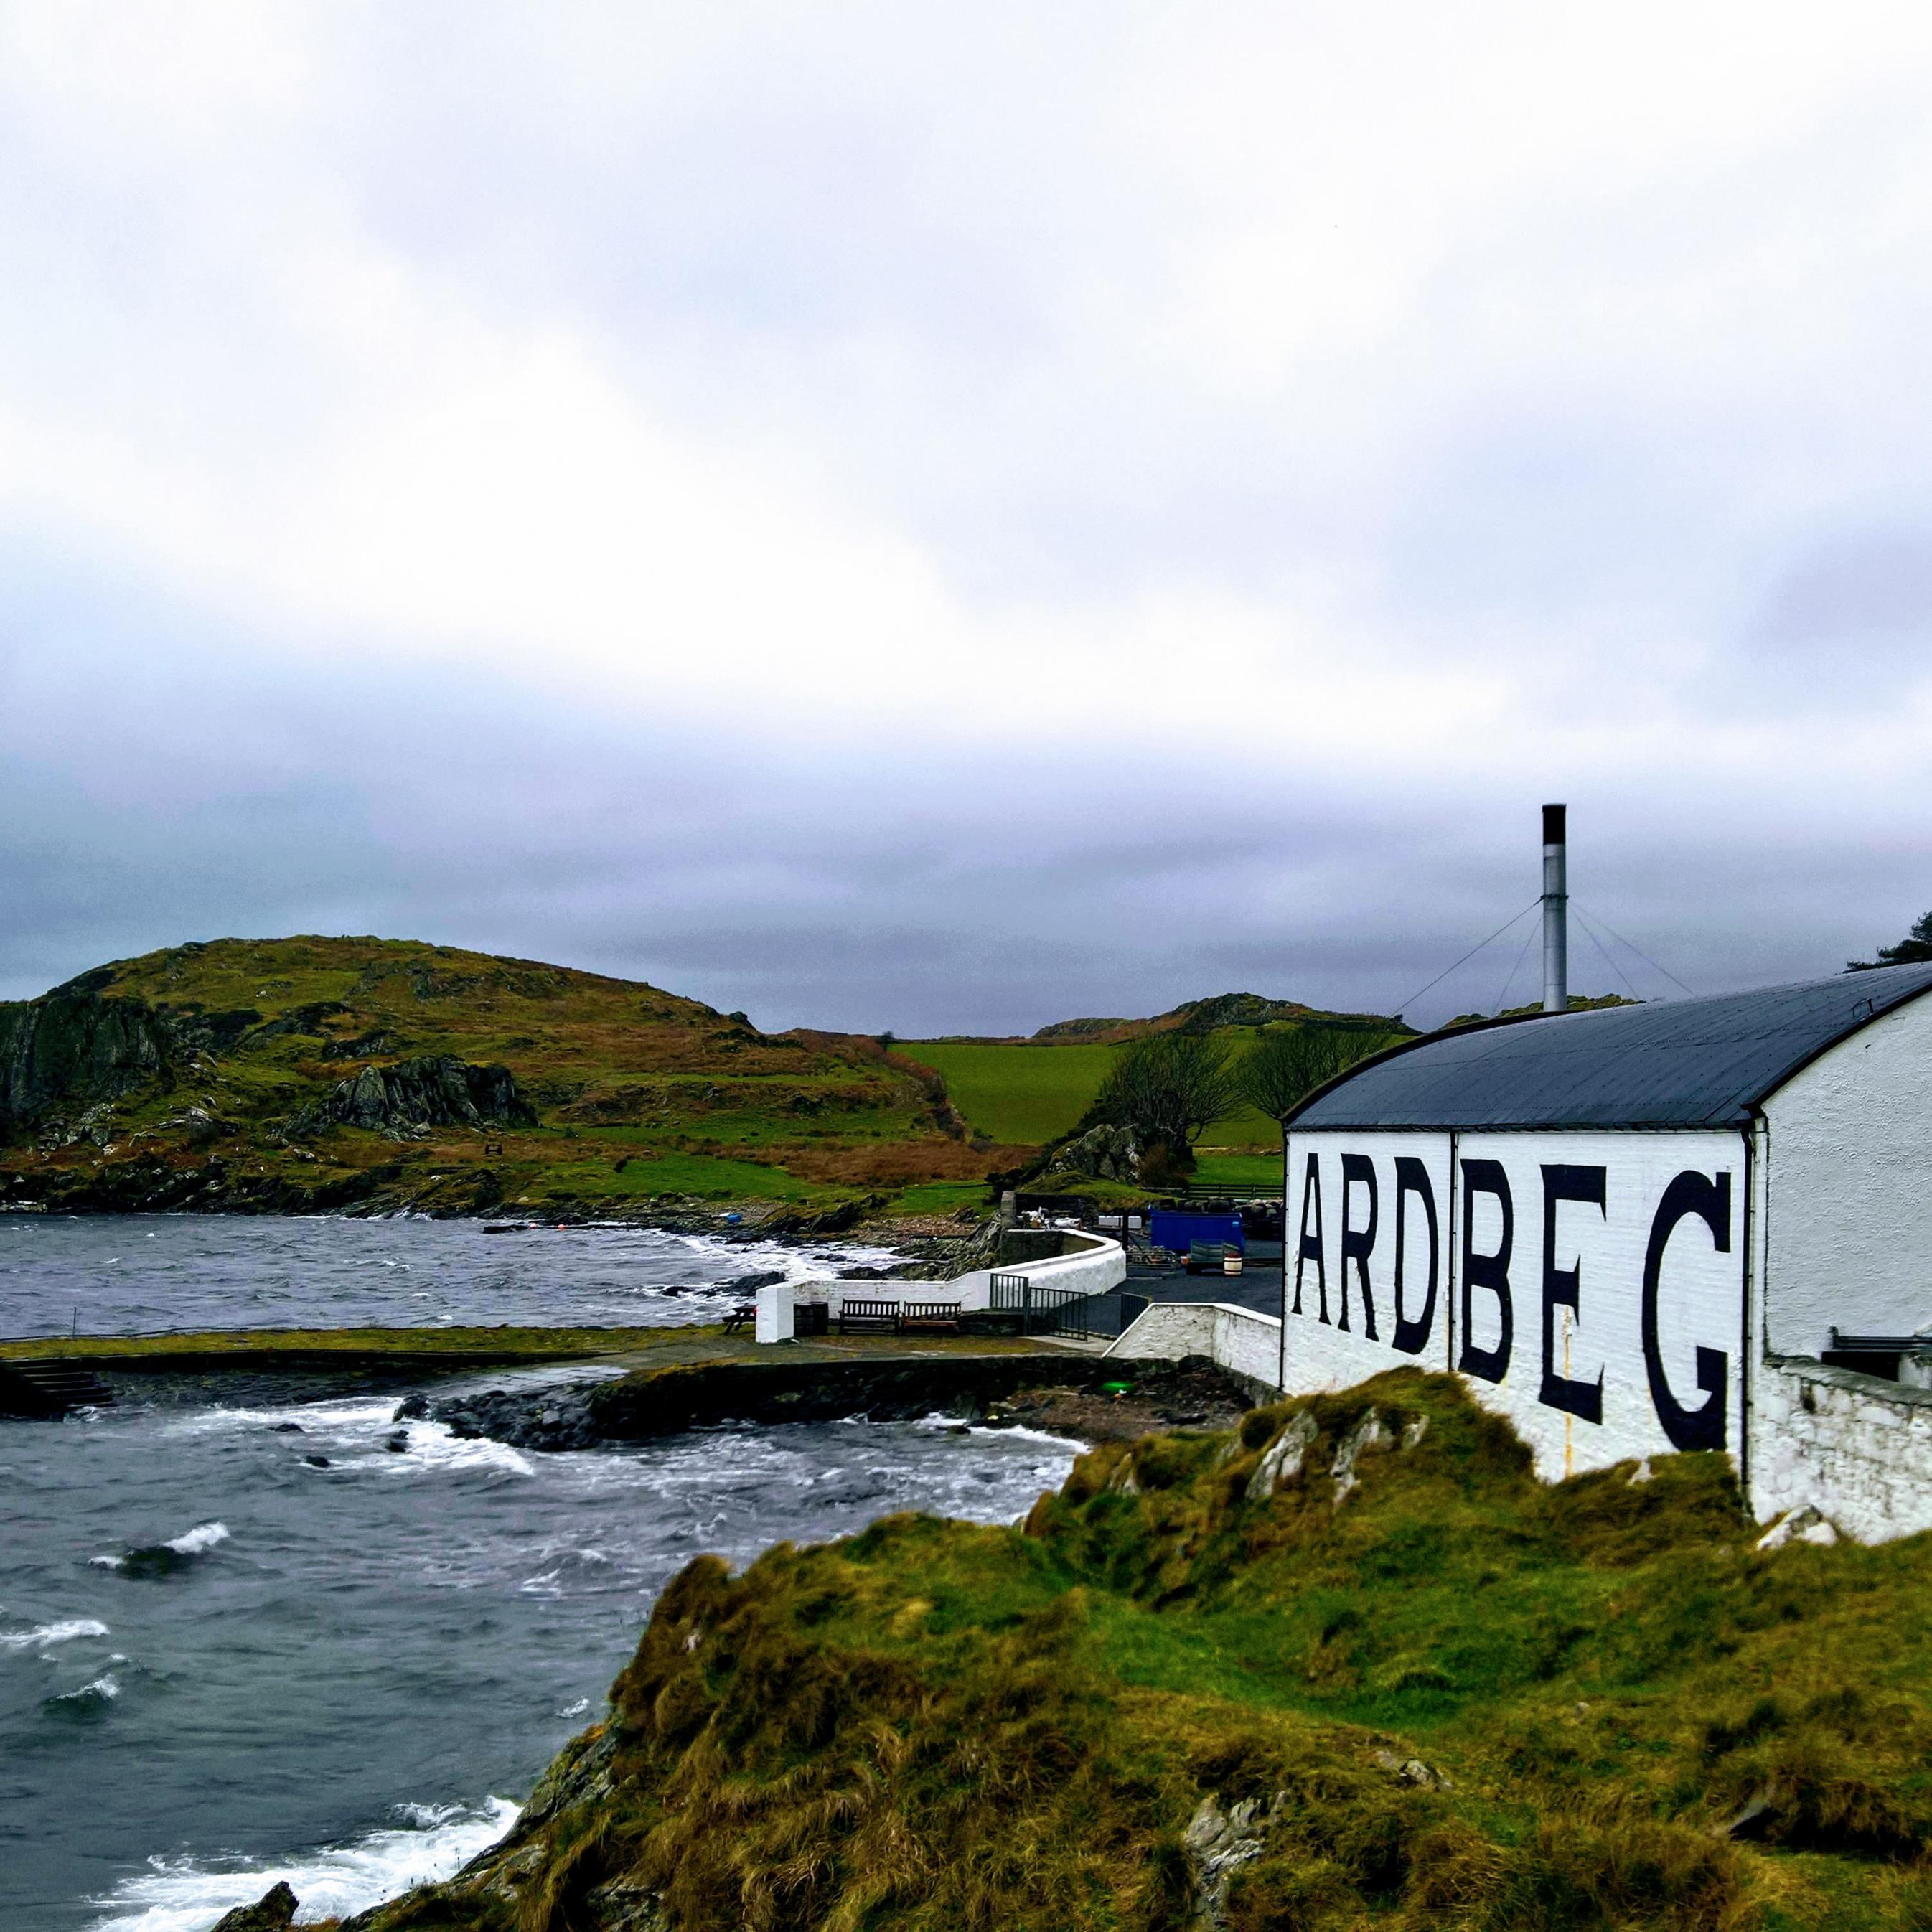 scotch-climate-change